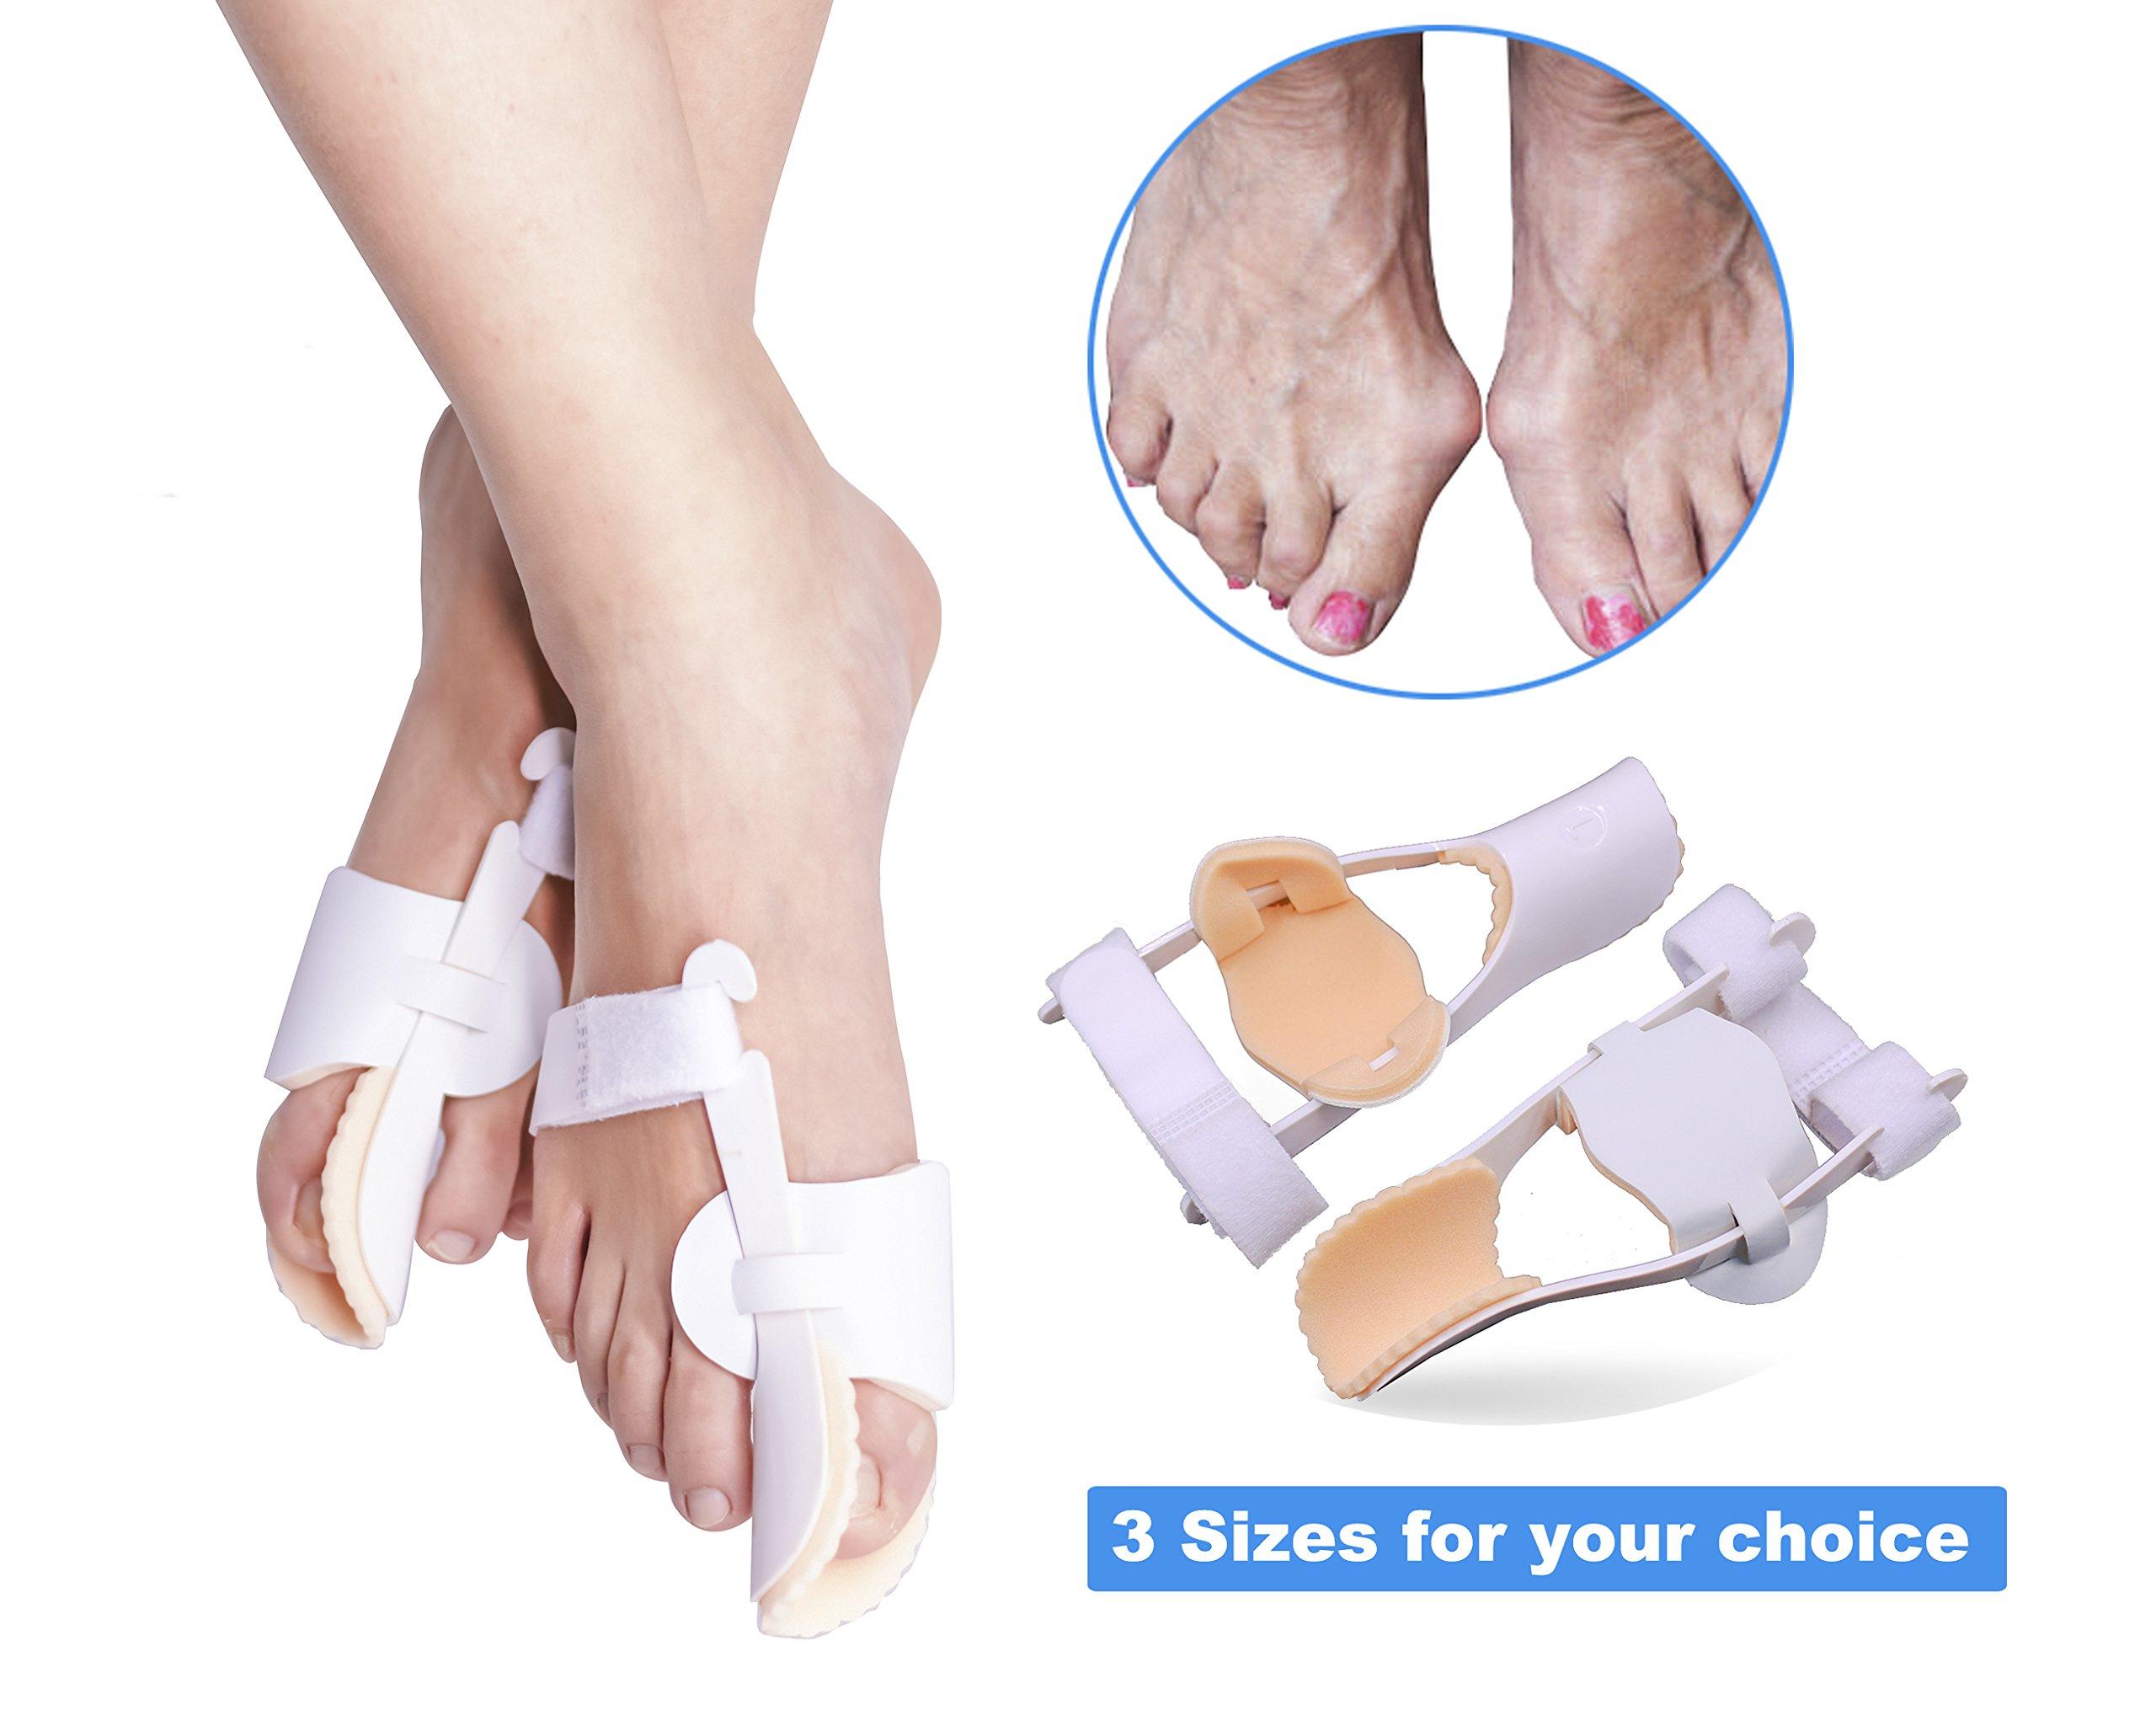 3 Sizes Bunion Corrector, Hallux Valgus Bunion Brace Splint Pads for Foot Bunion Relieve Relief Aid Surgery Treatment Toe Separators Straighteners by ERGOfoot [S]